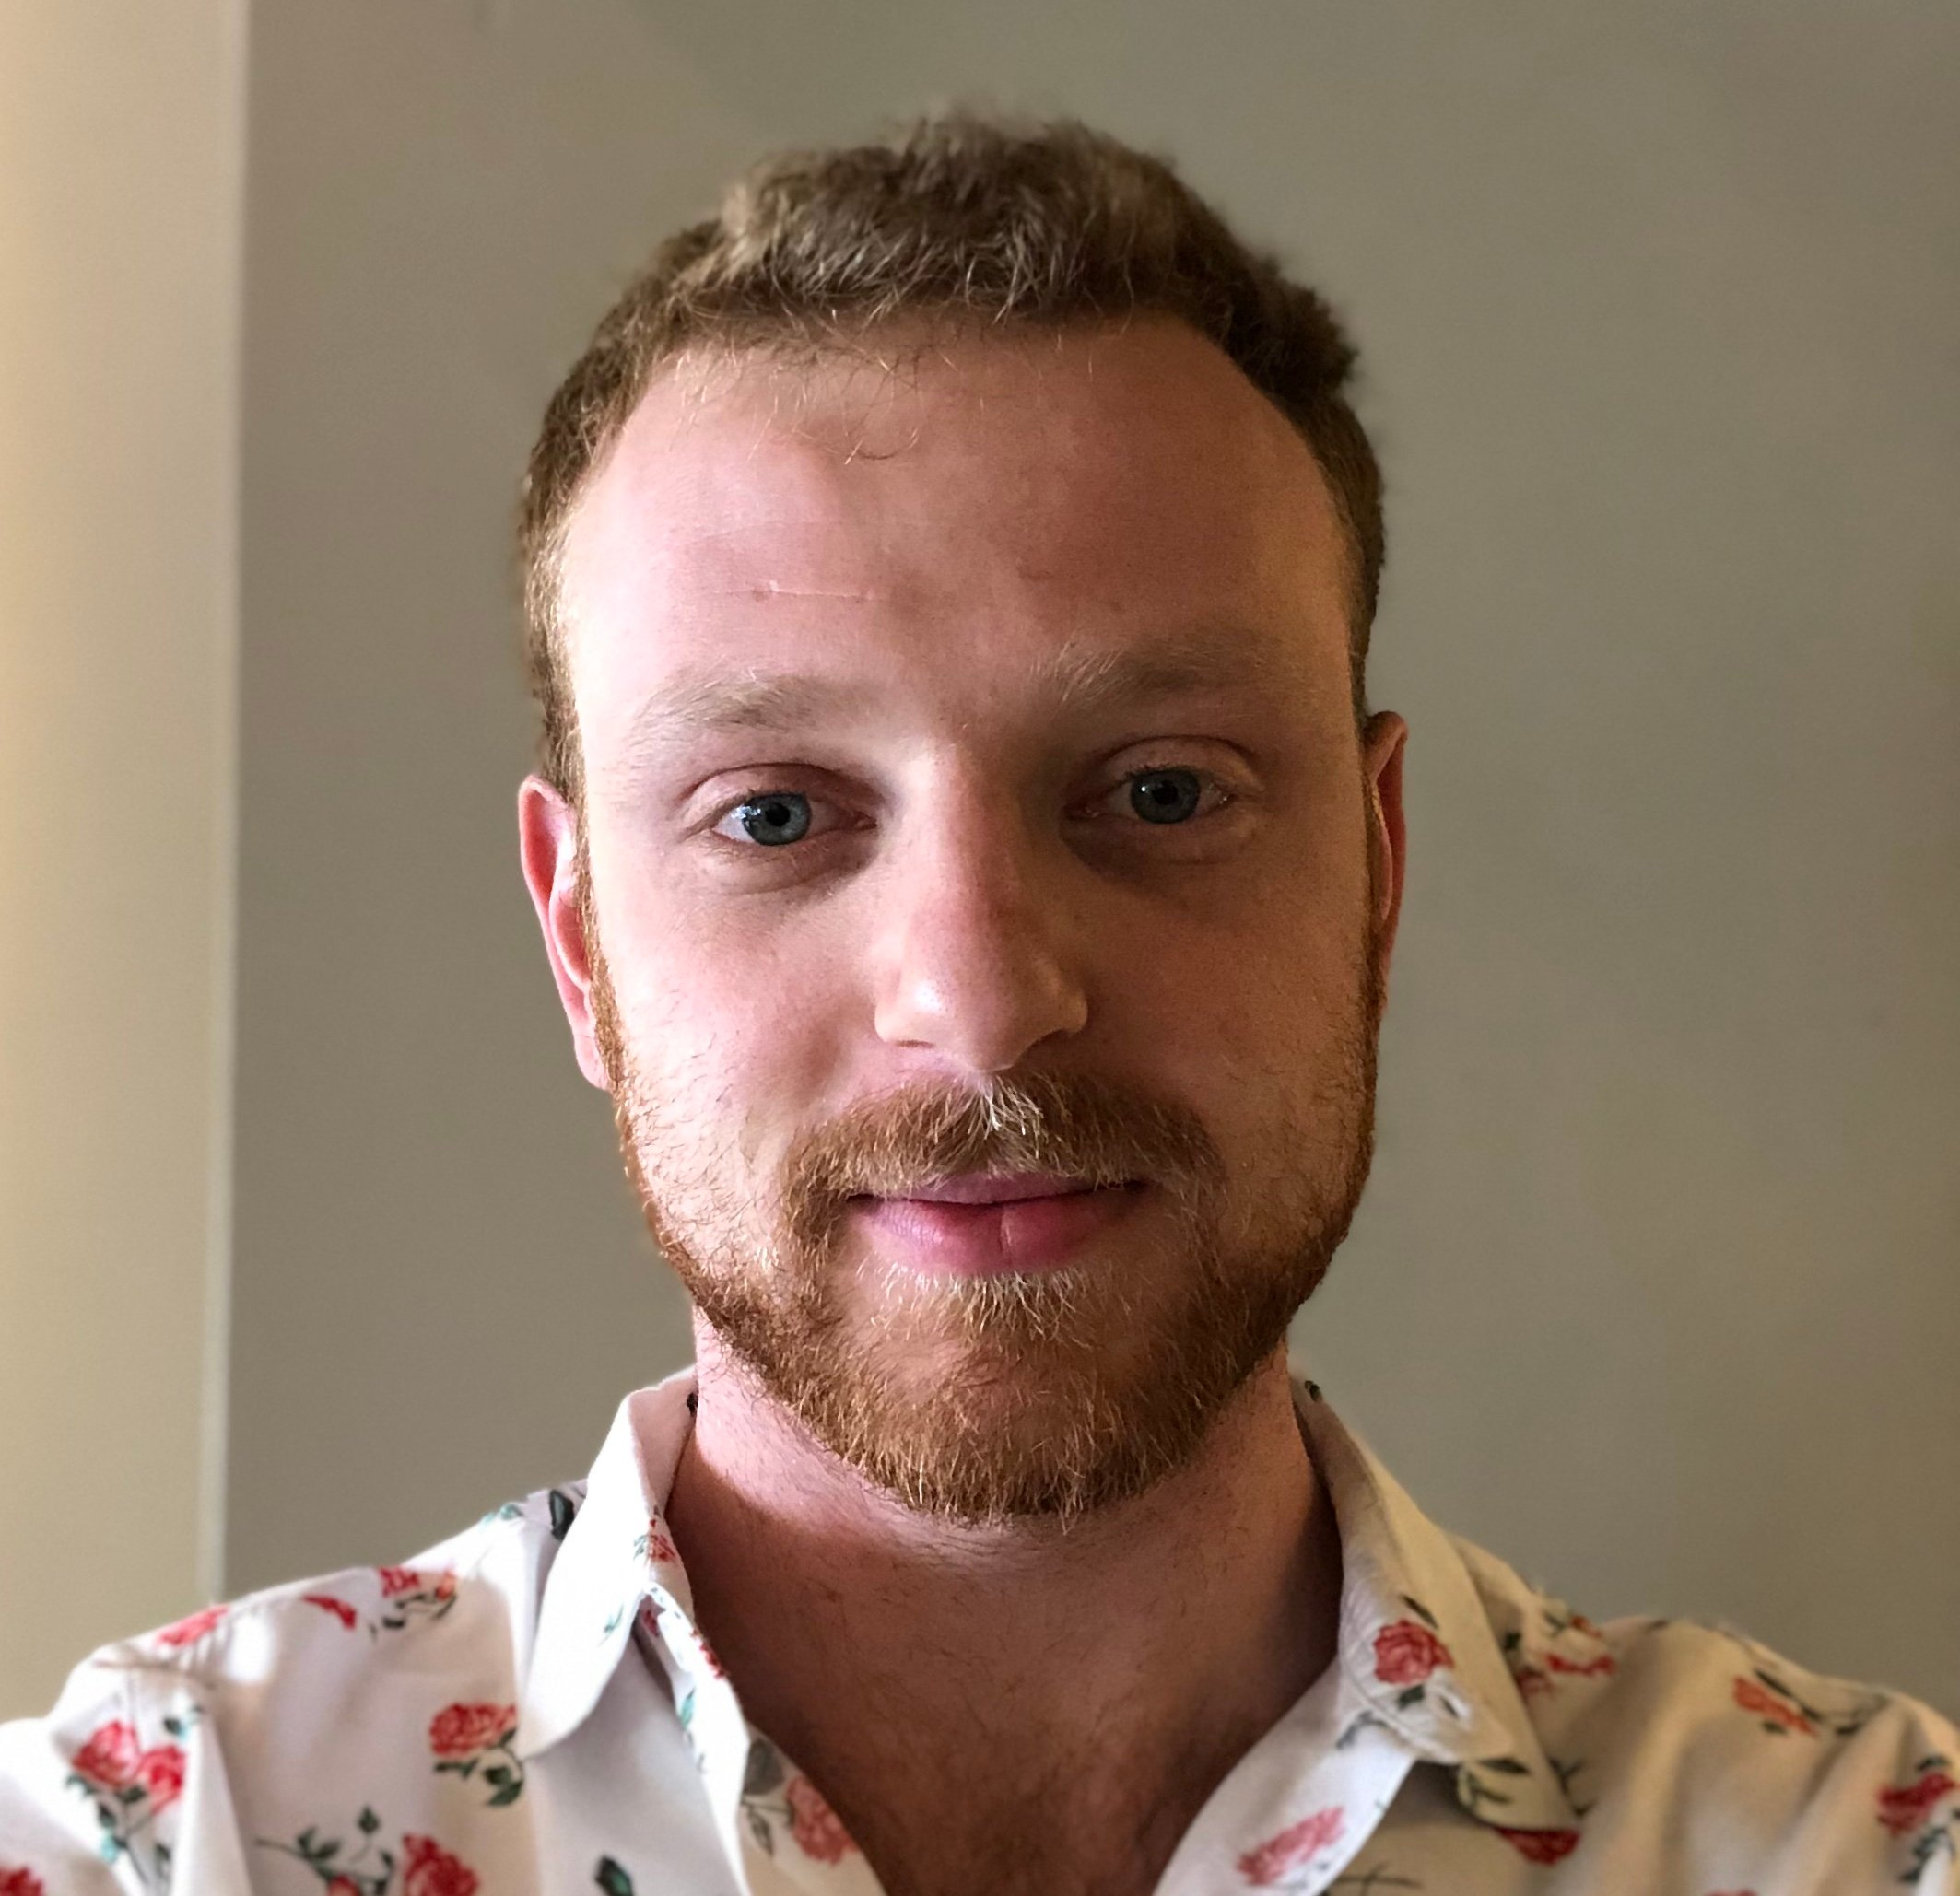 Mikey Franklin, Senior Campaign Advisor